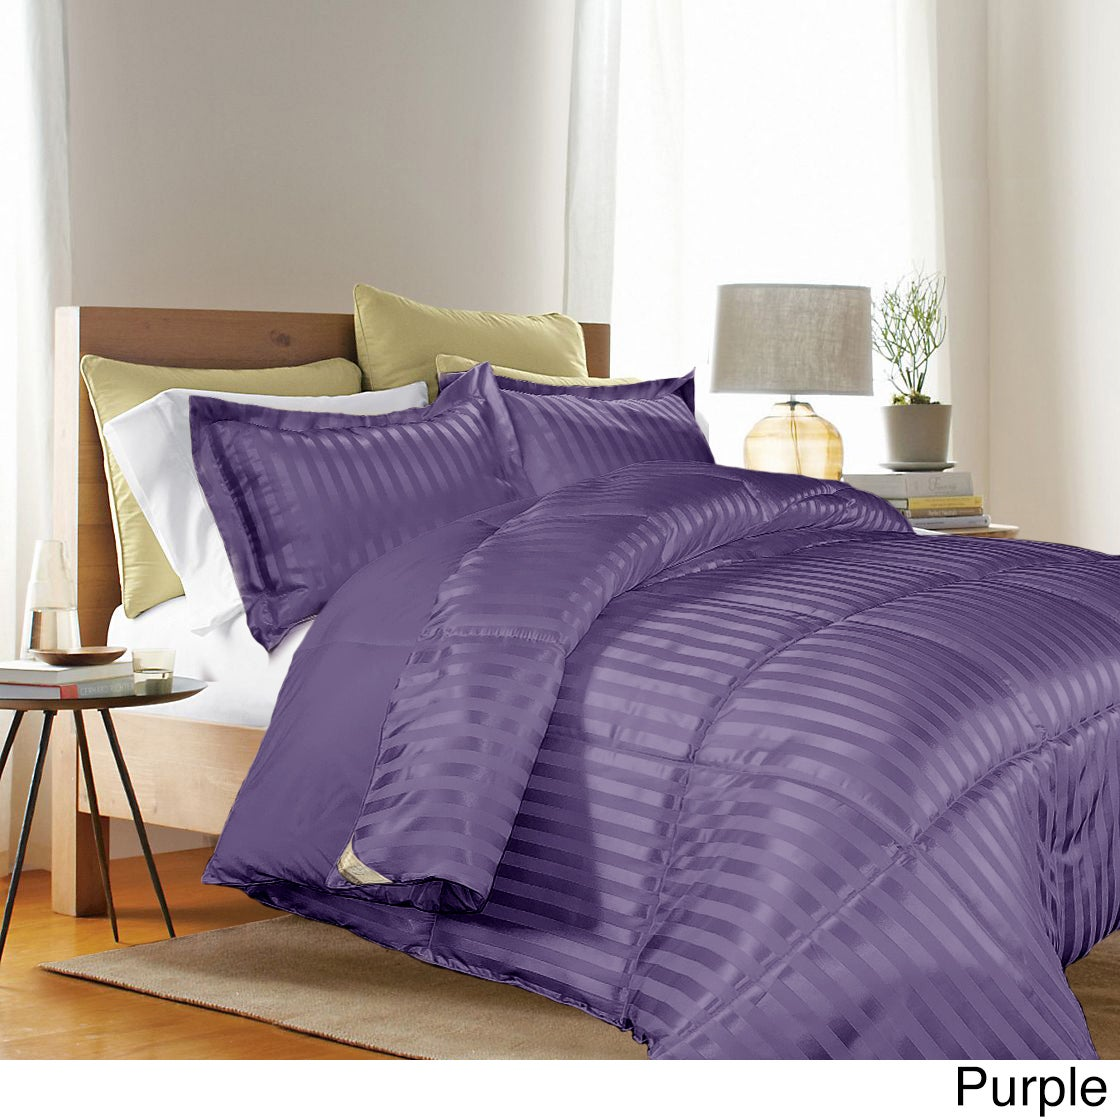 dsc alternative purple comforter super beds fits top pillow quality high light down comforters bedding oversized